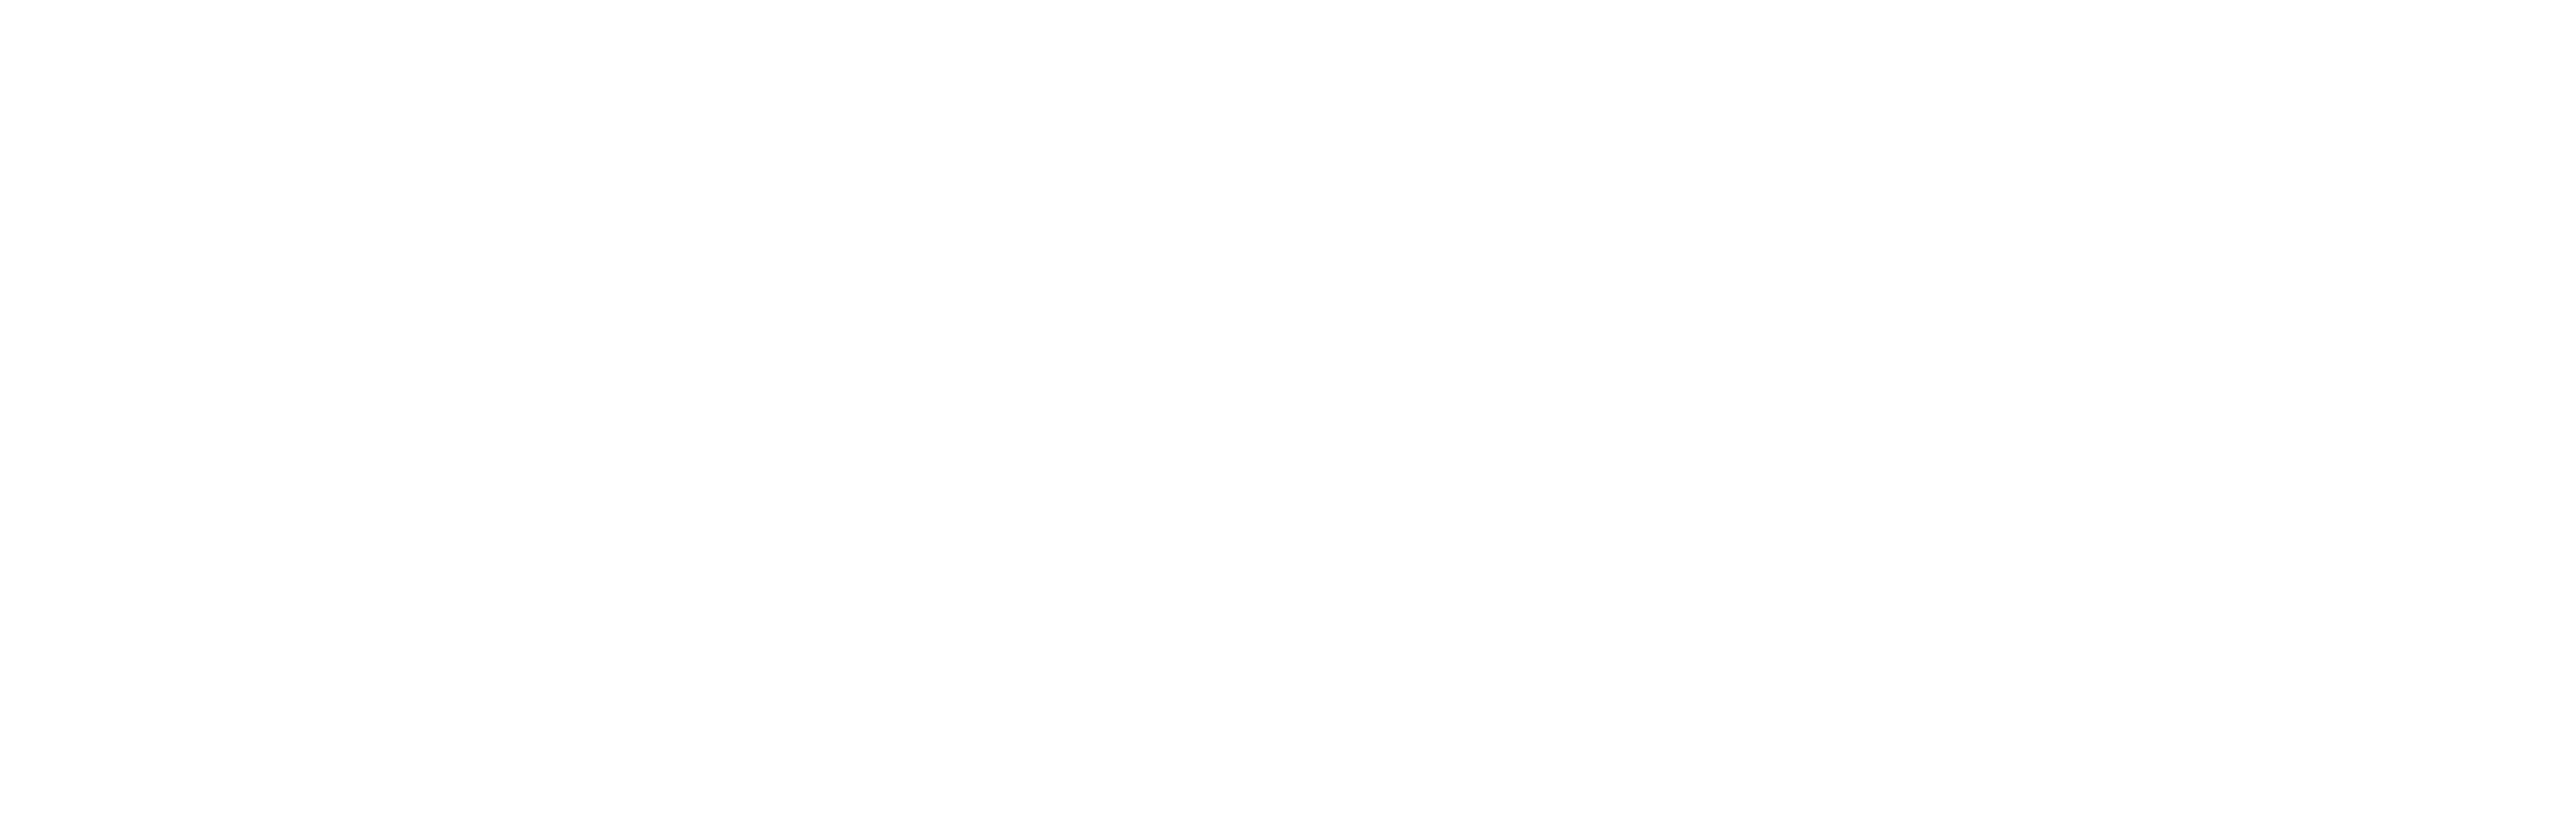 Worldwide IVF เด็กหลอดแก้ว รักษาผู้มีบุตรยาก รักษาภาวะมีบุตรยาก